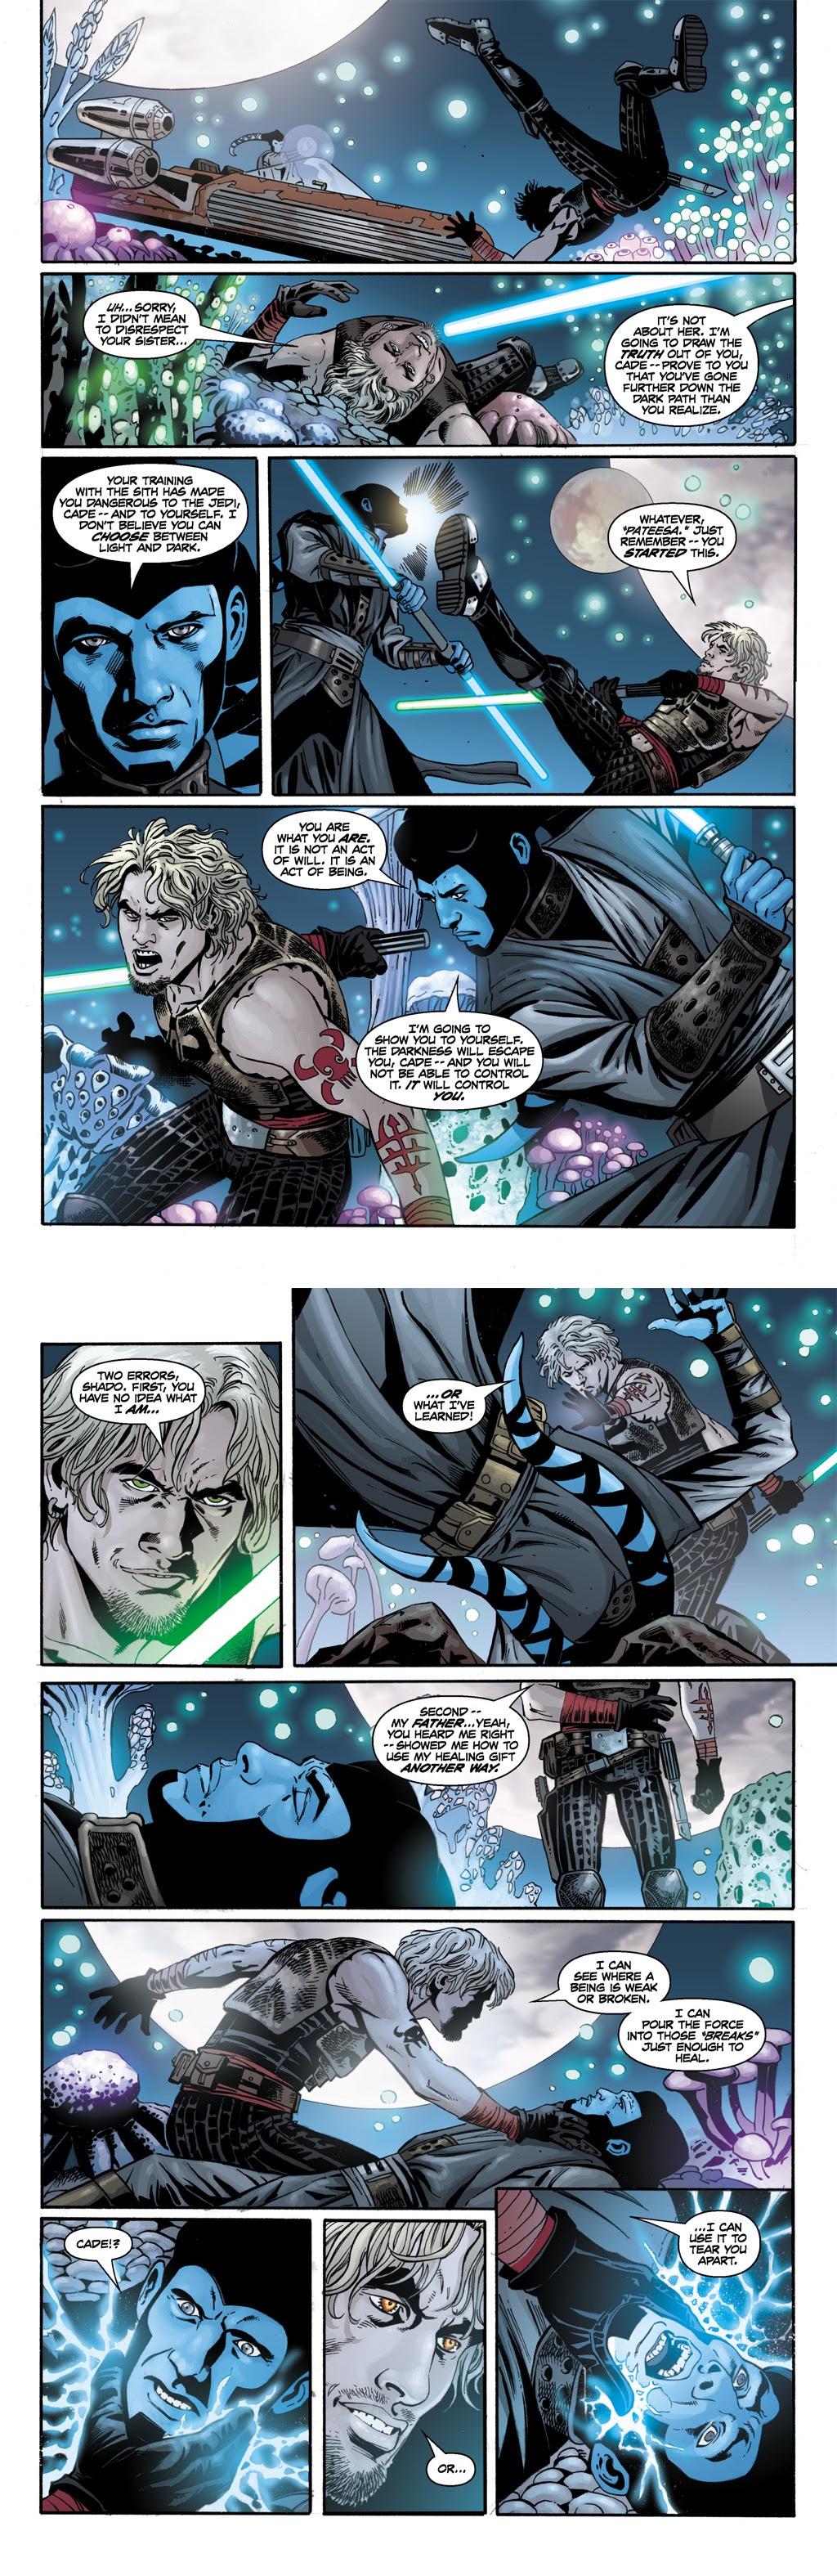 Stomper Showdown R2 #8 - Antares Draco (Informal Geek) vs TUF! Jacen Solo (RNGesus4) Cade_Shado